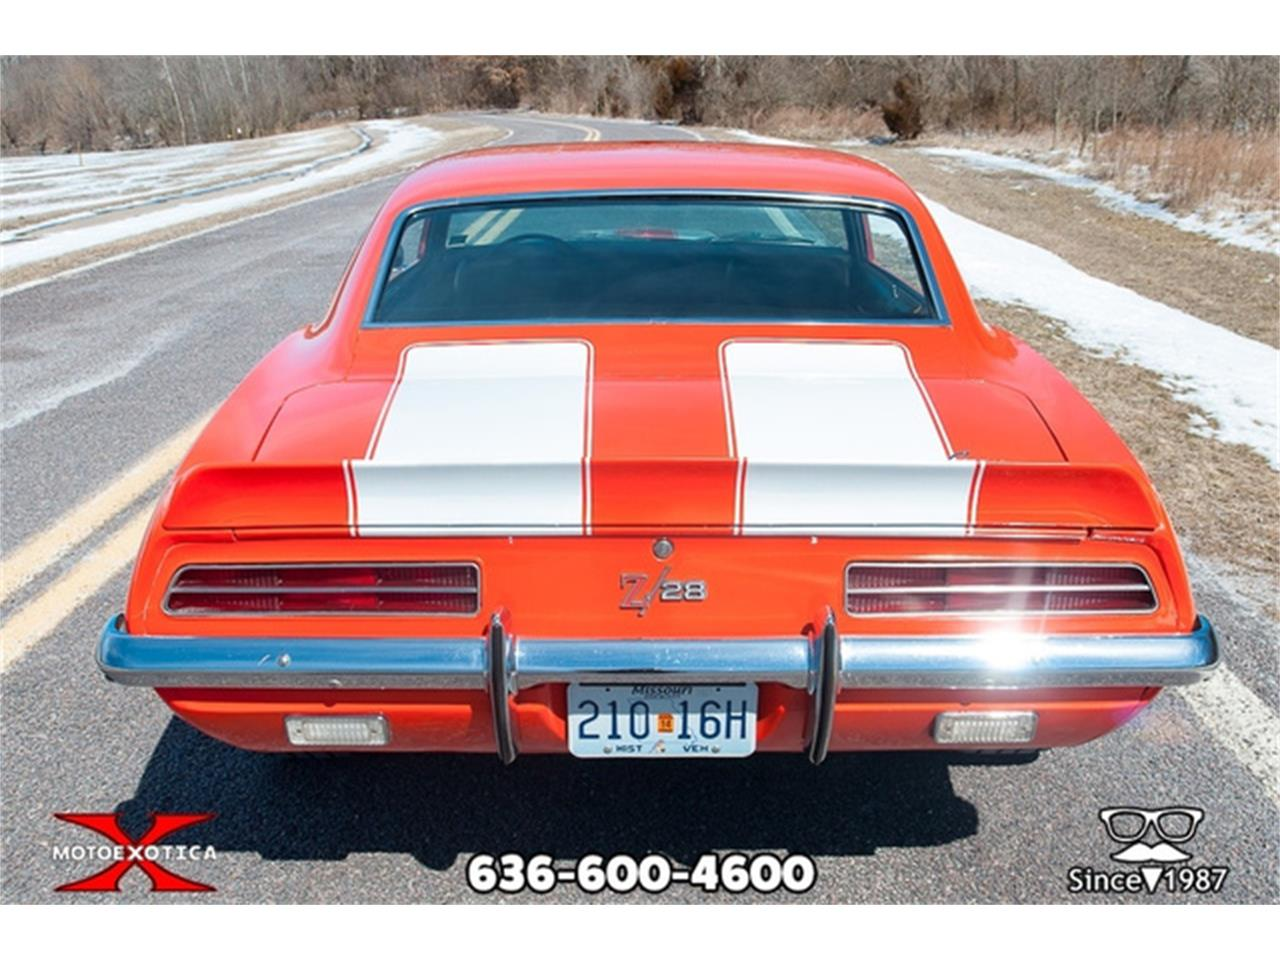 For Sale: 1969 Chevrolet Camaro Z28 in St  Louis, Missouri